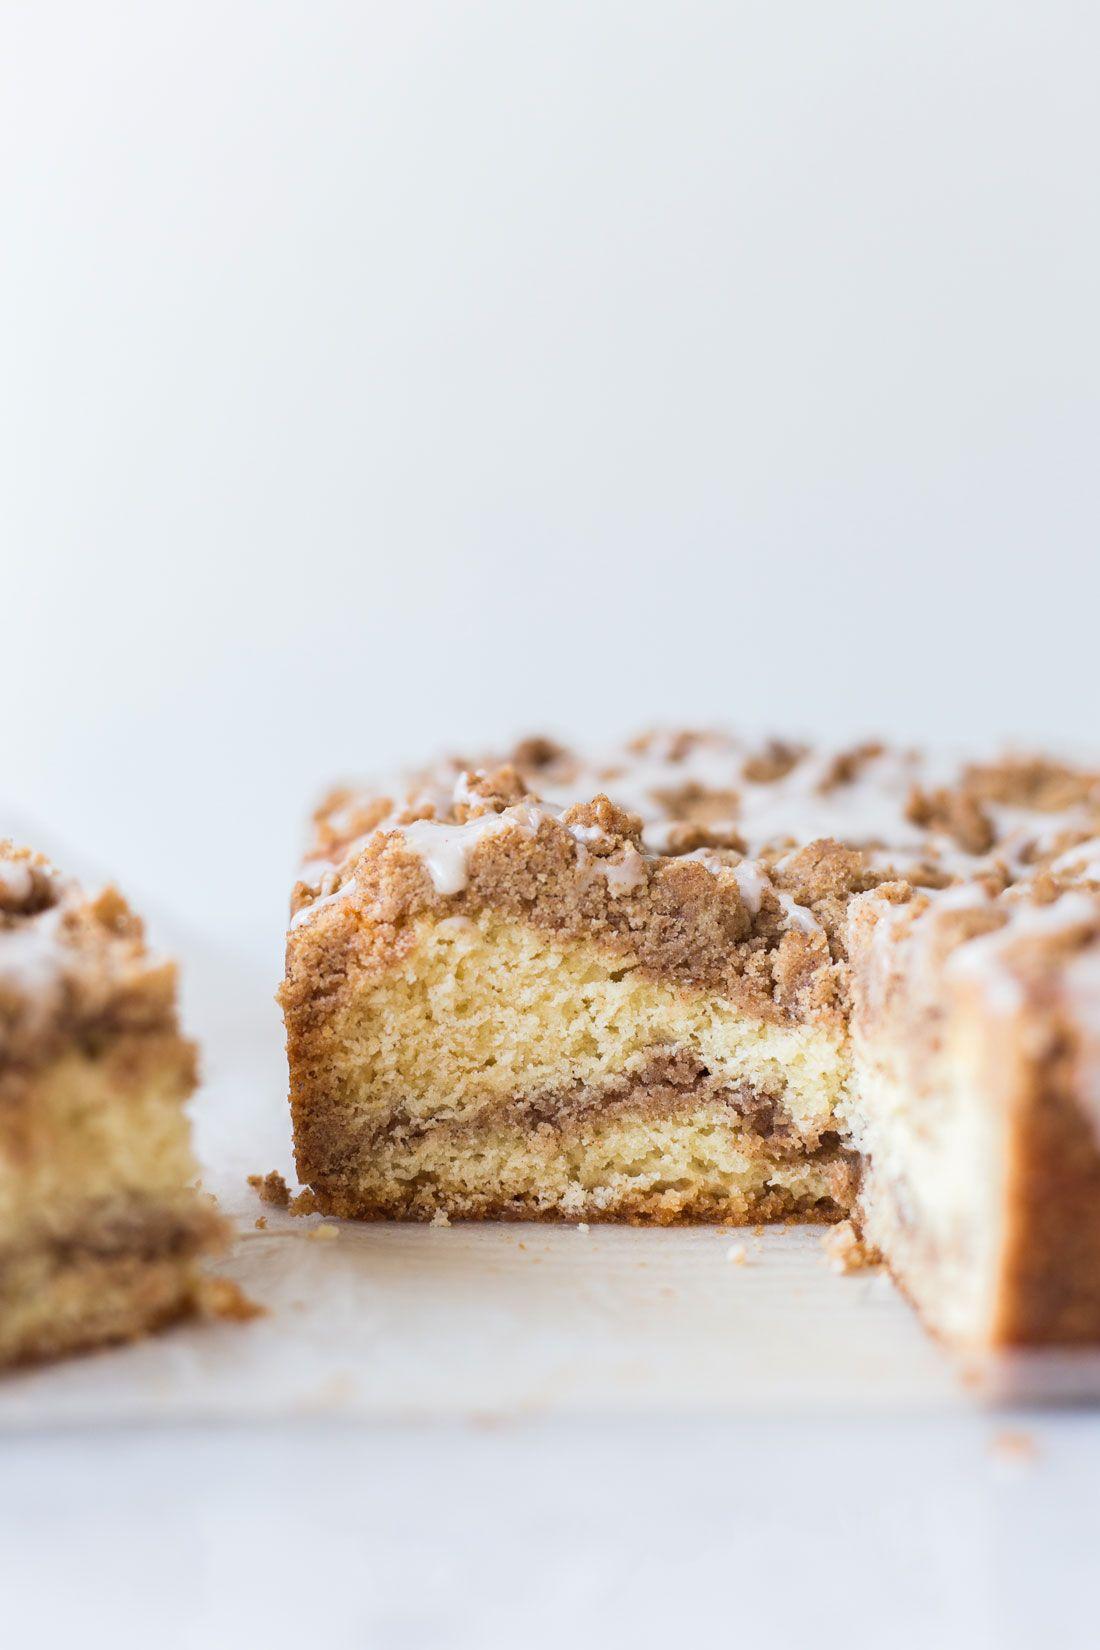 Cinnamon swirl coffee cake with vanilla glaze miss jones